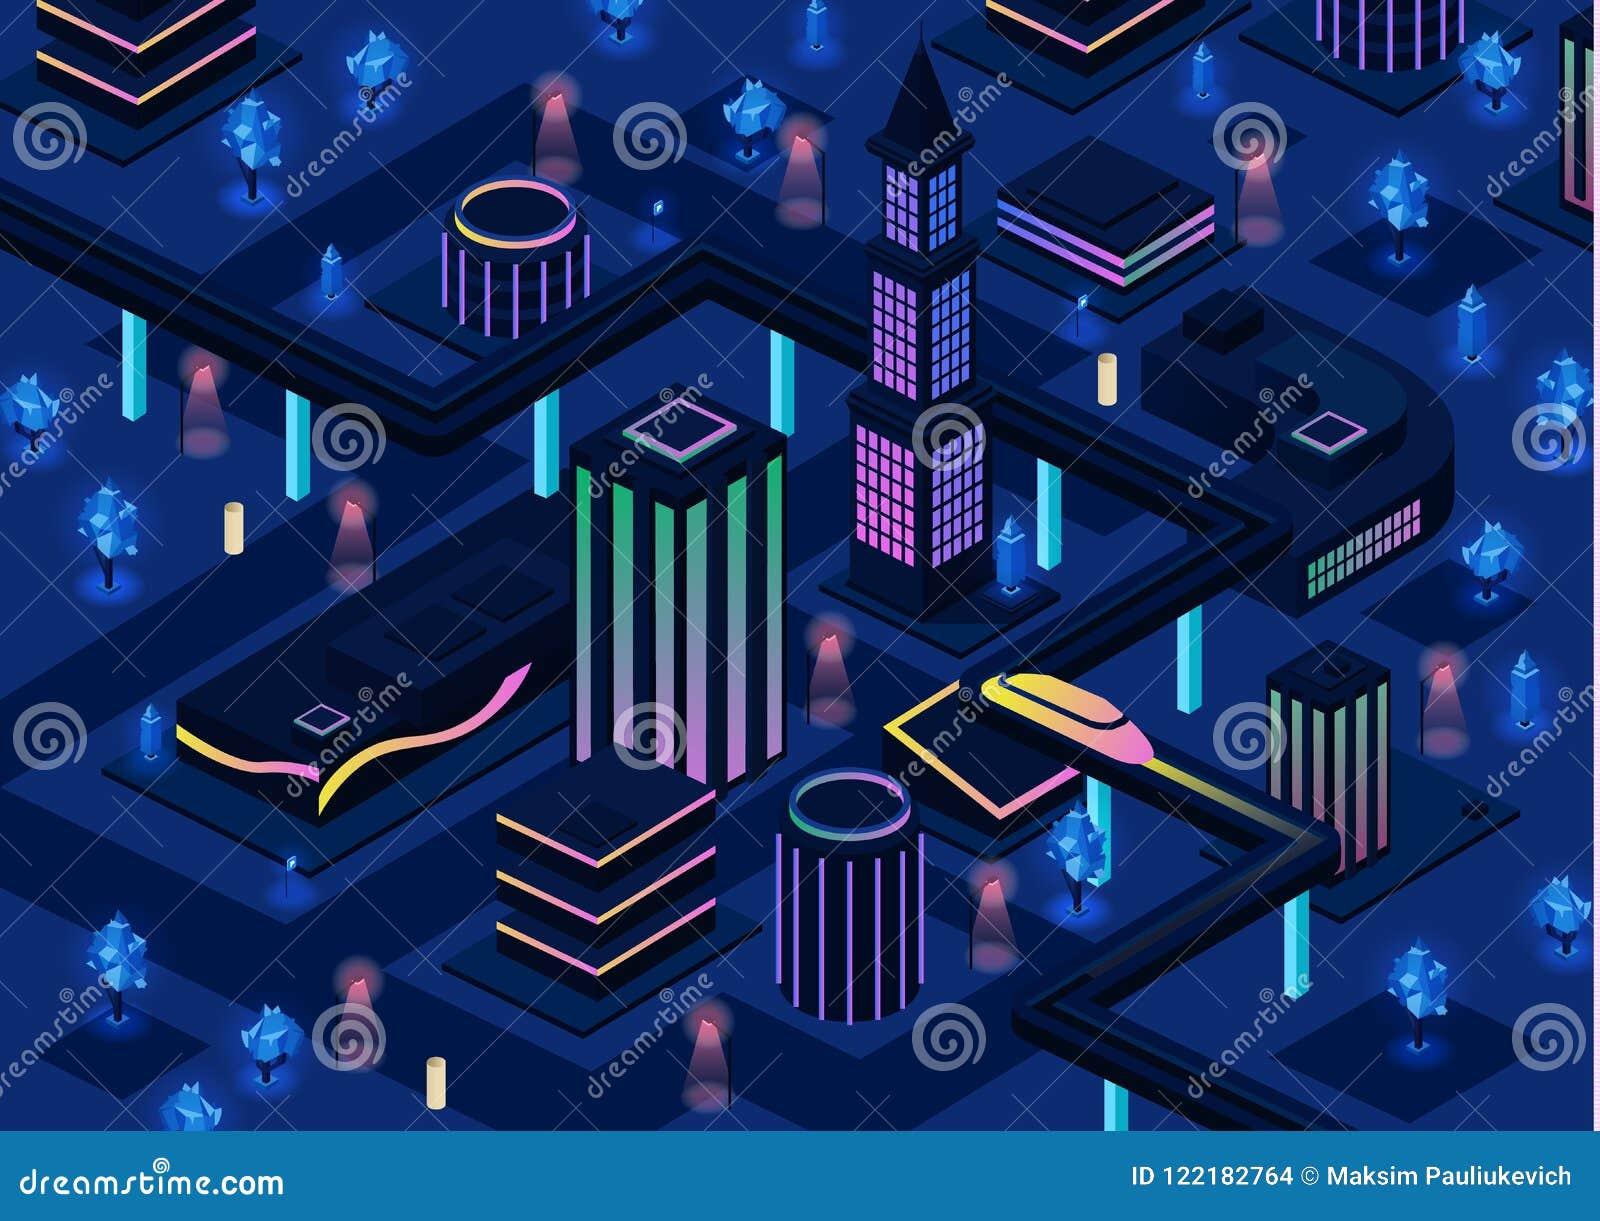 Isometric futuristic city illustration of 3d future night smart city infrastructure with illumination technology